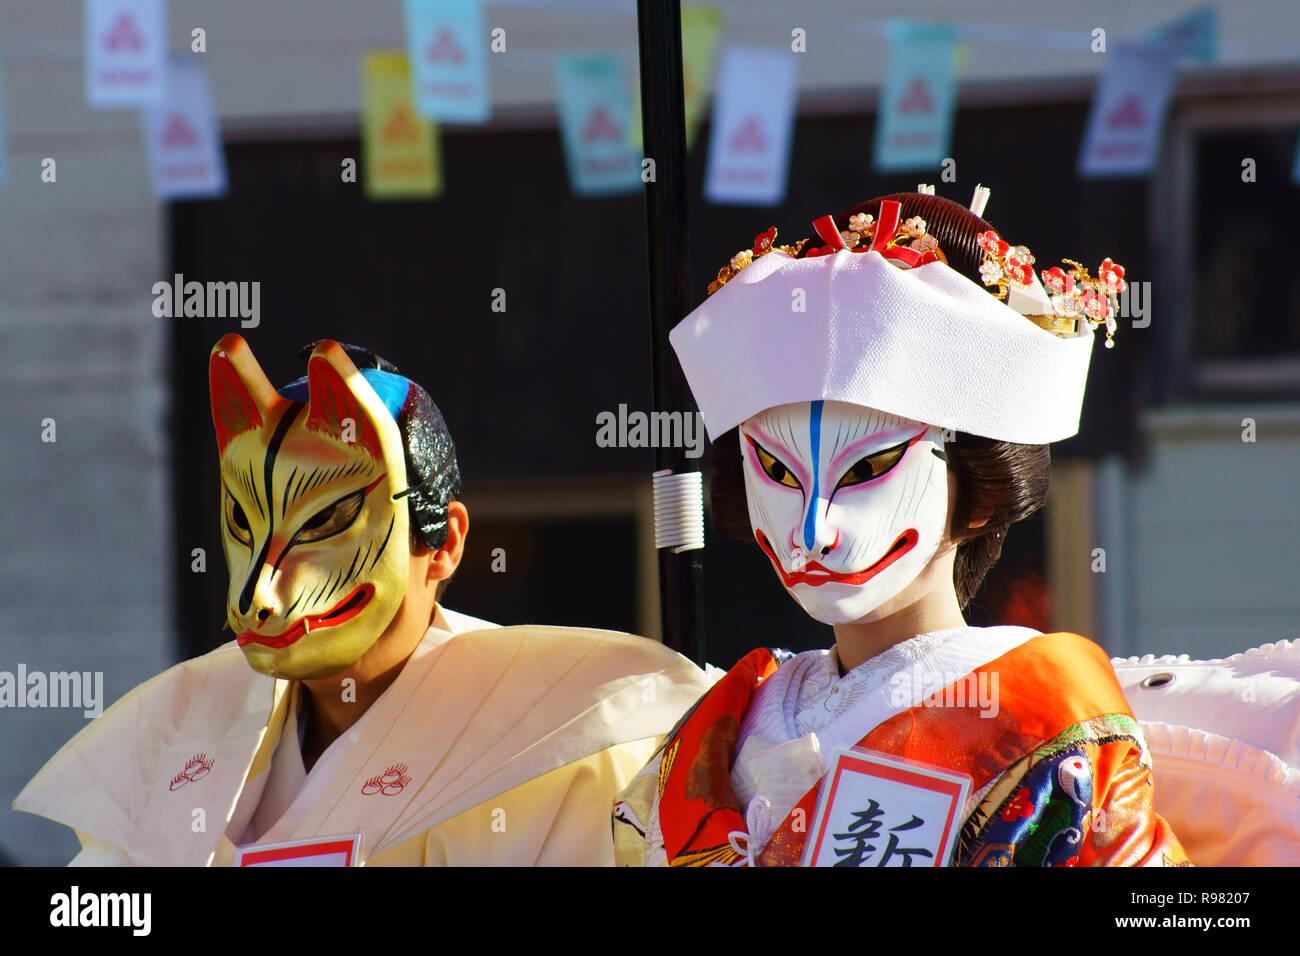 Fox S Wedding.Kitsune No Yomeiri Fox S Wedding Reproduction Event Yamaguchi